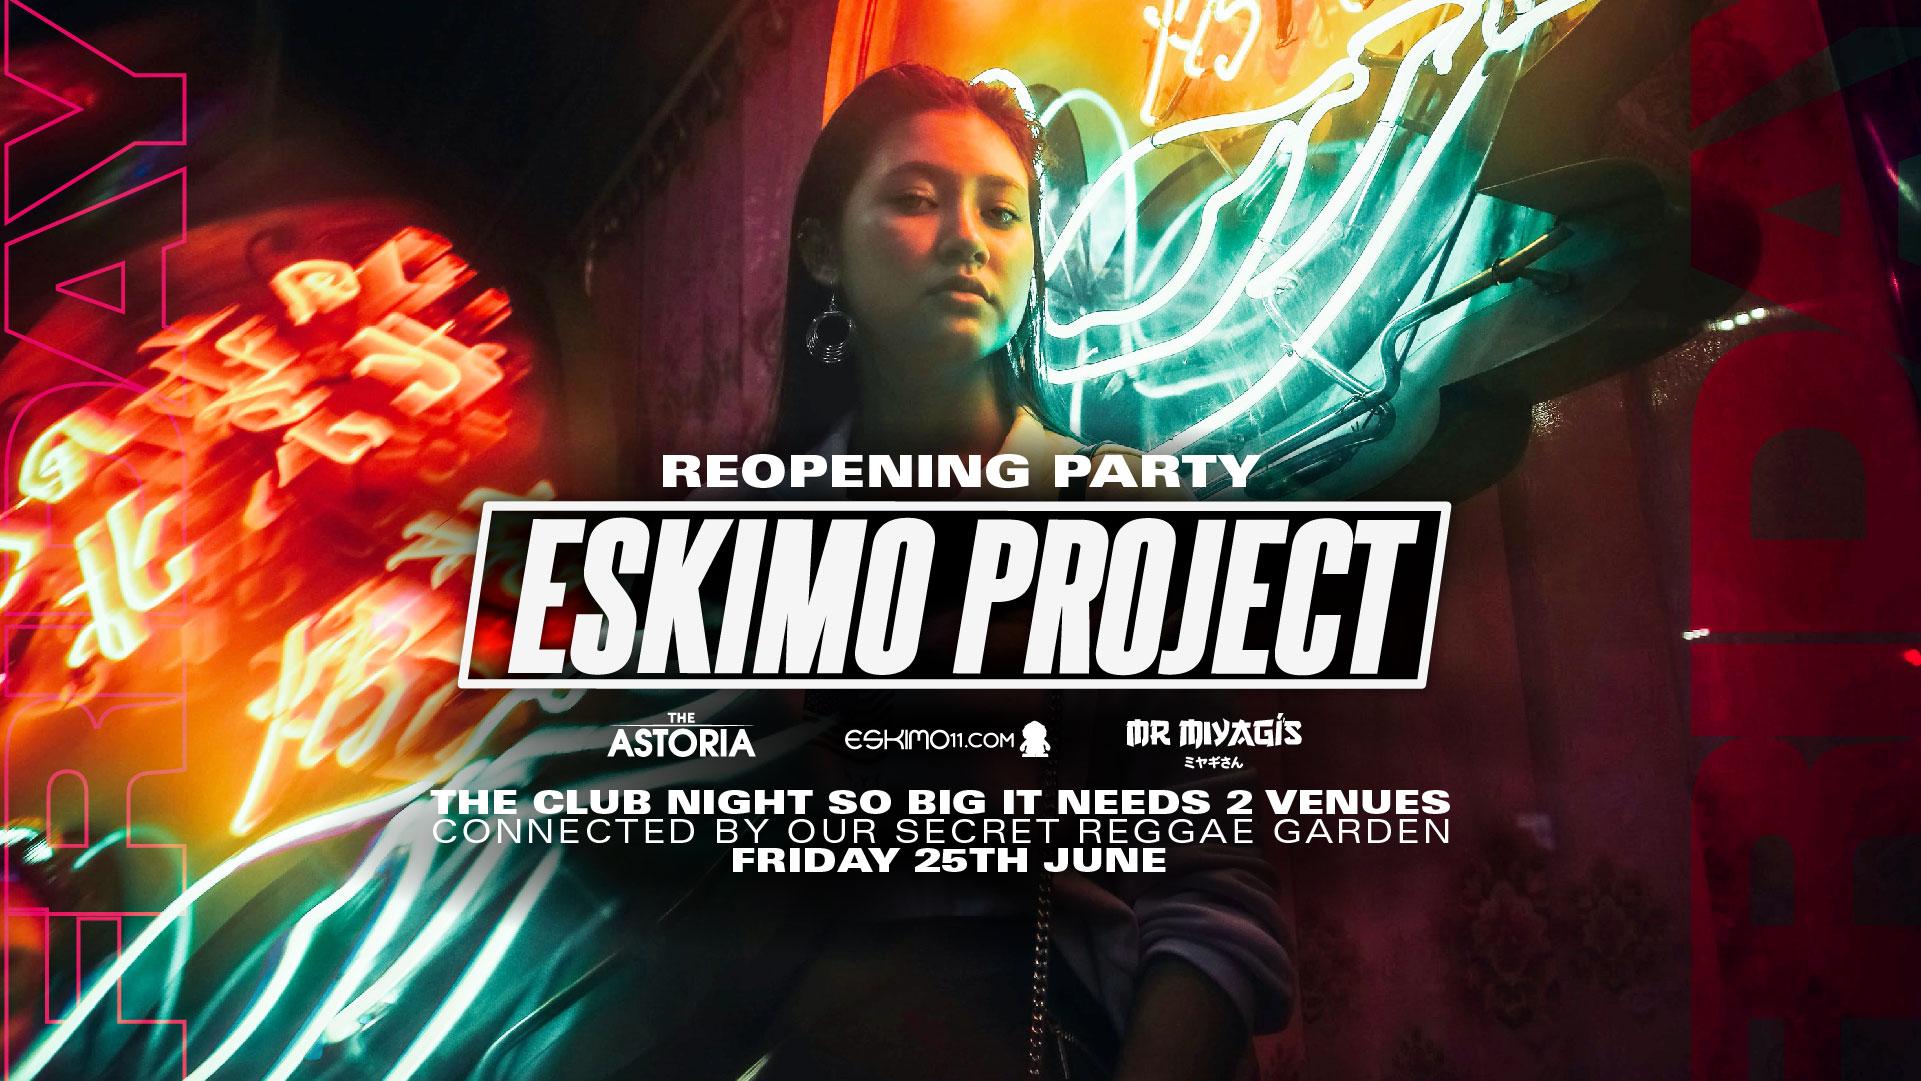 The Eskimo Project Returns – Astoria and Mr Miyagis